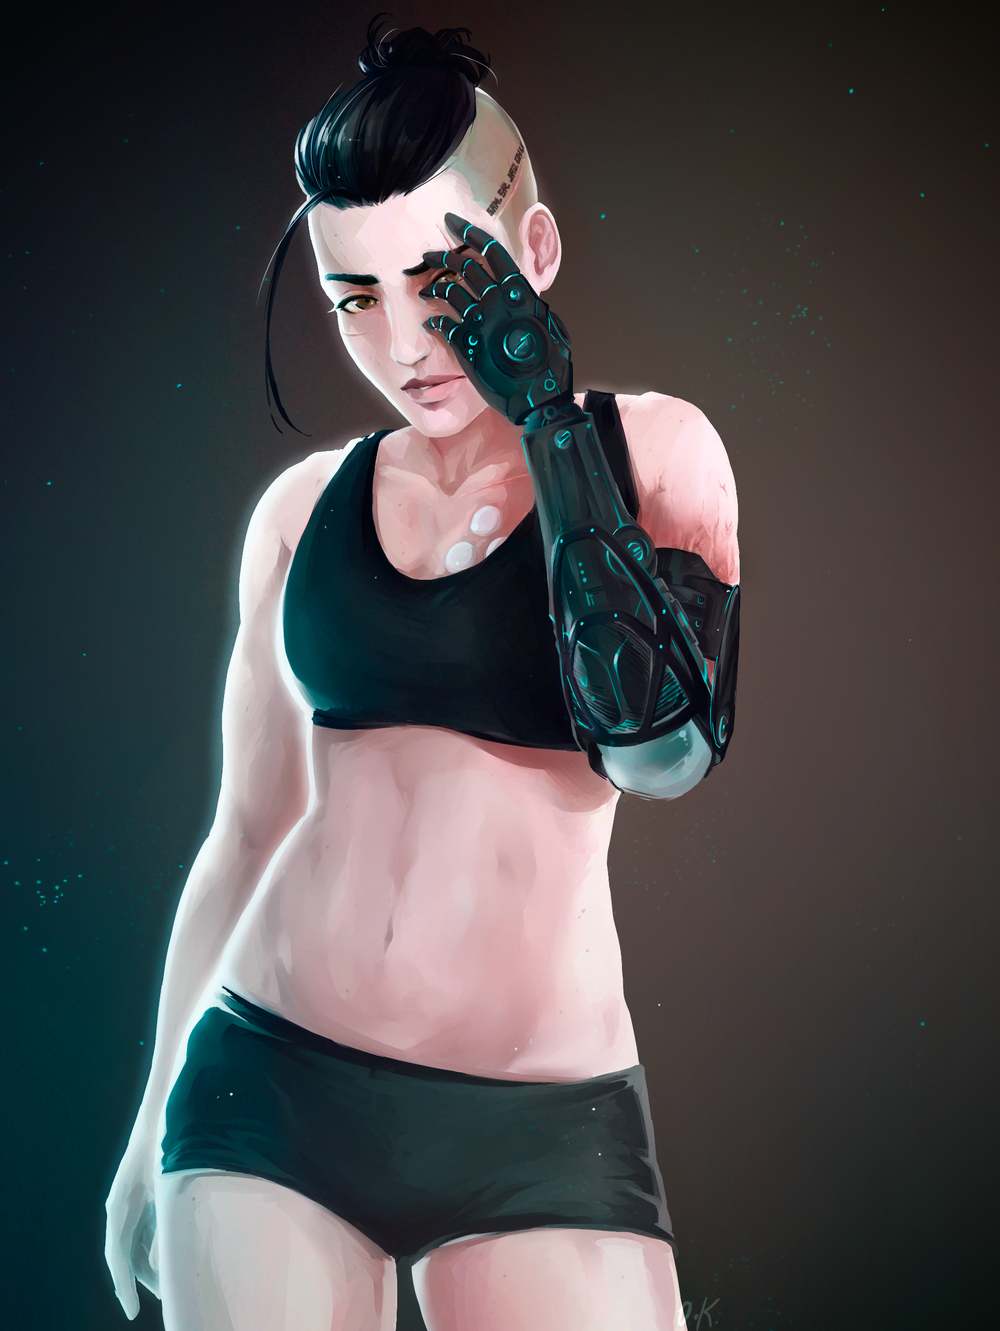 Sara Ryder - Prosthetic